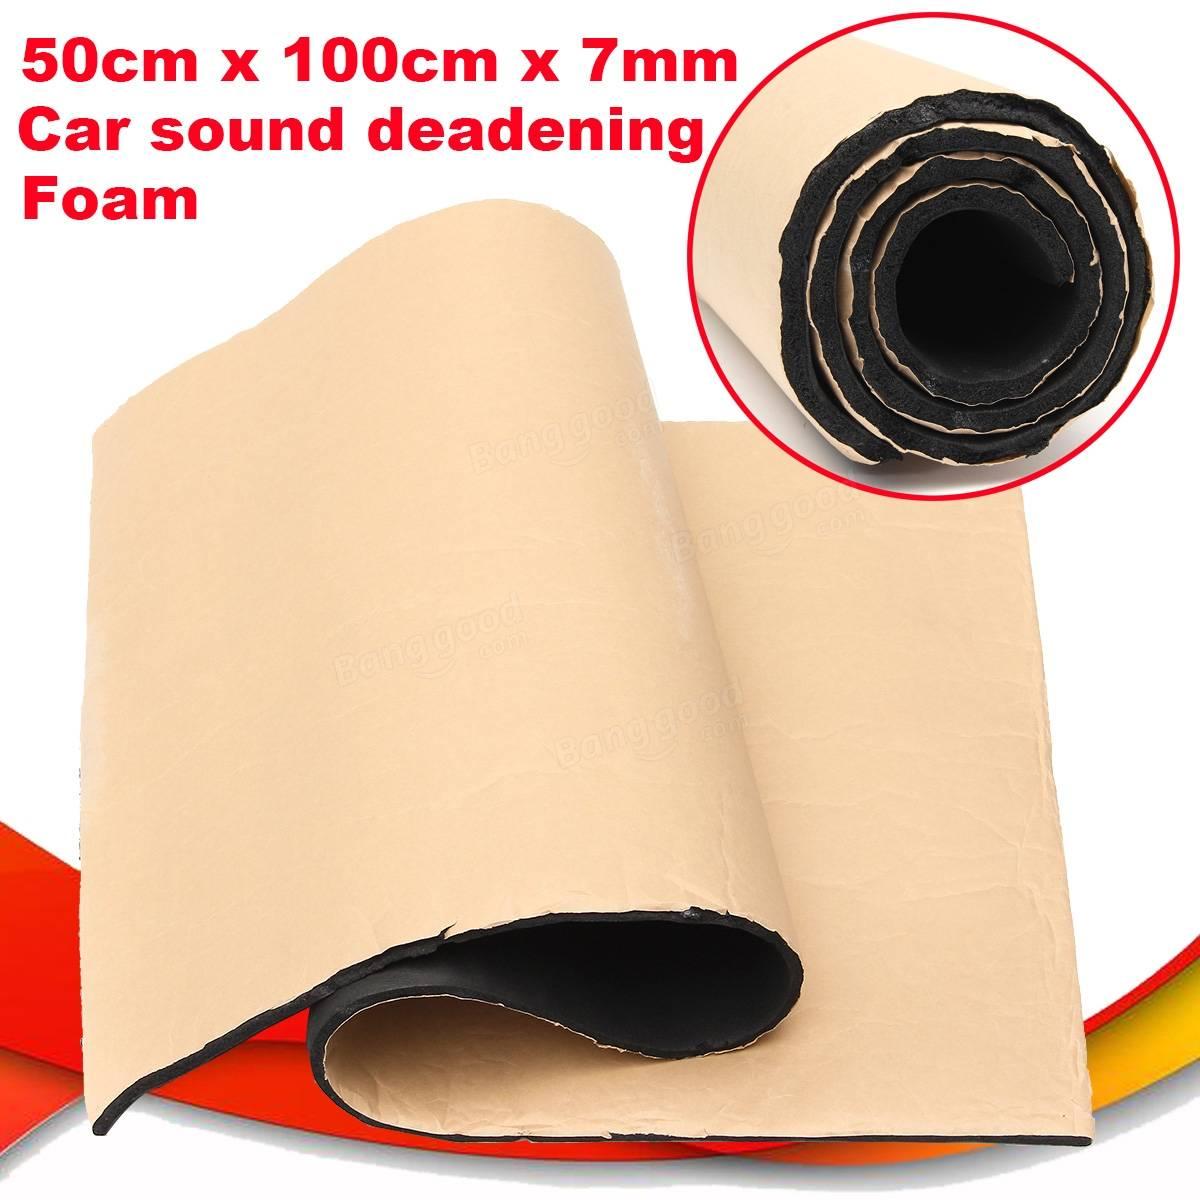 2roll 7mm car sound proofing deadening insulation closed cell foam 50x100cm sale. Black Bedroom Furniture Sets. Home Design Ideas